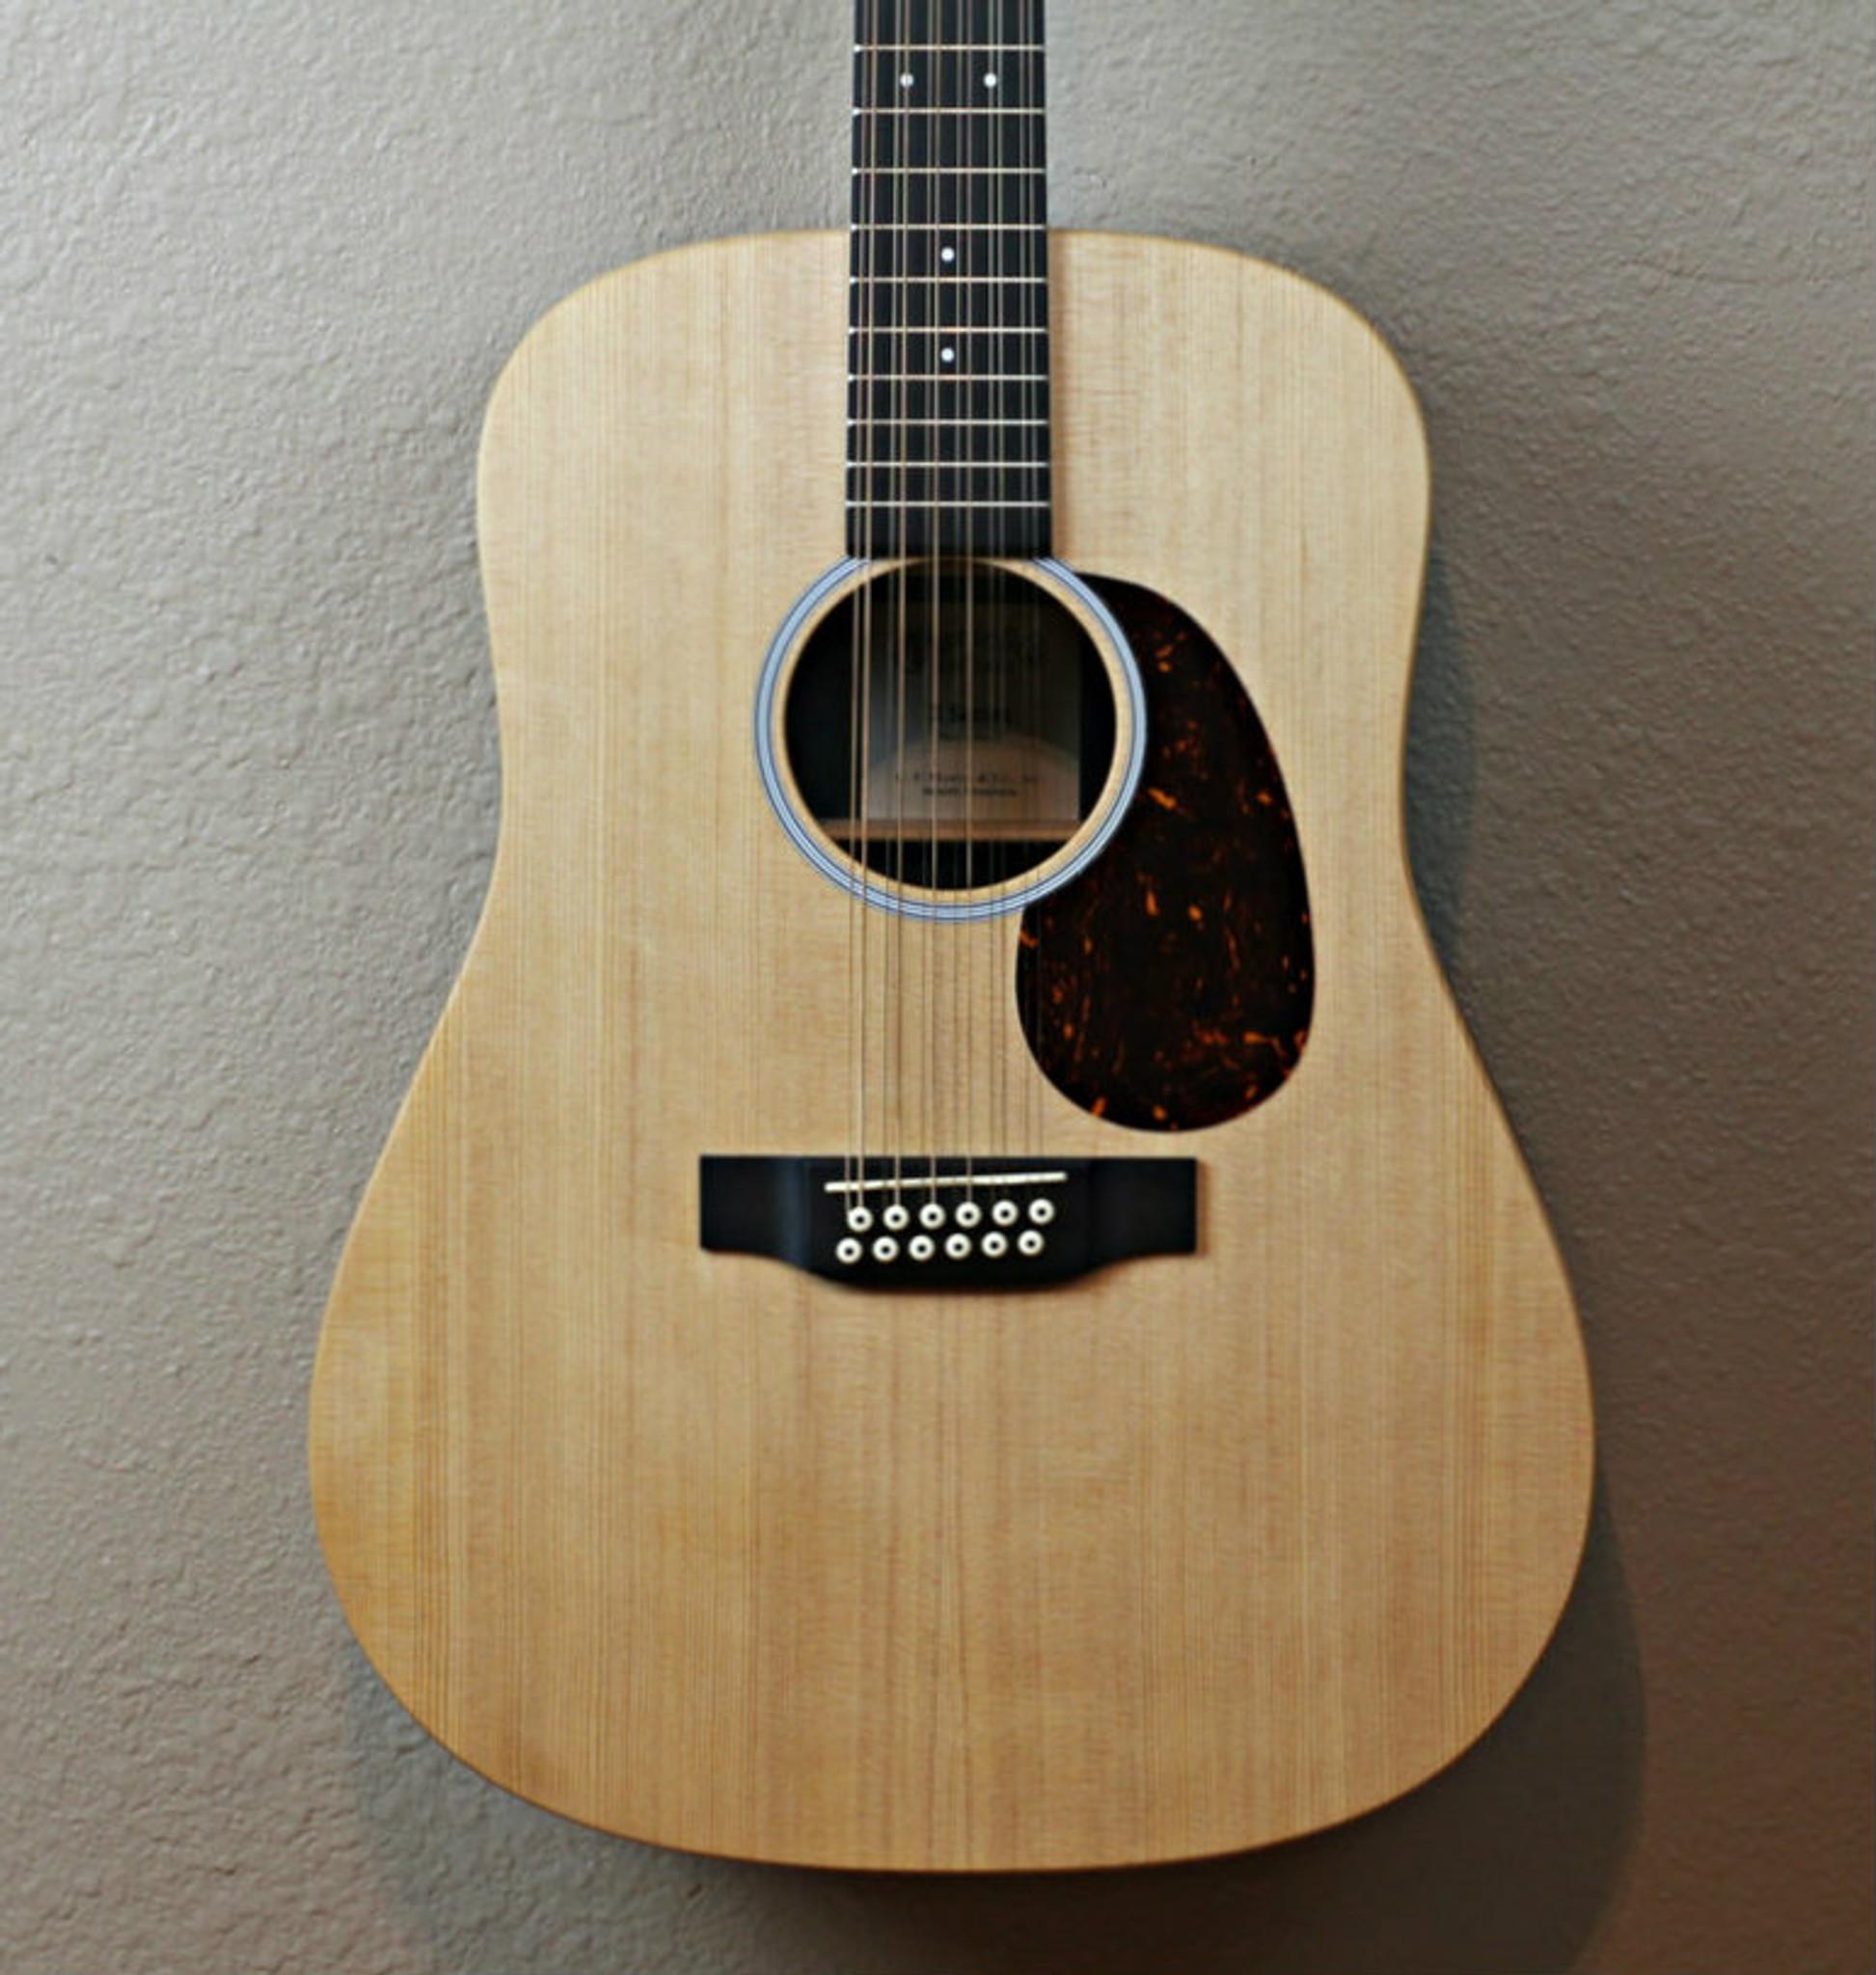 Acoustic Electric Guitars Martin 12 String D12x1ae Acoustic Electric Guitar Strong Packing Musical Instruments & Gear